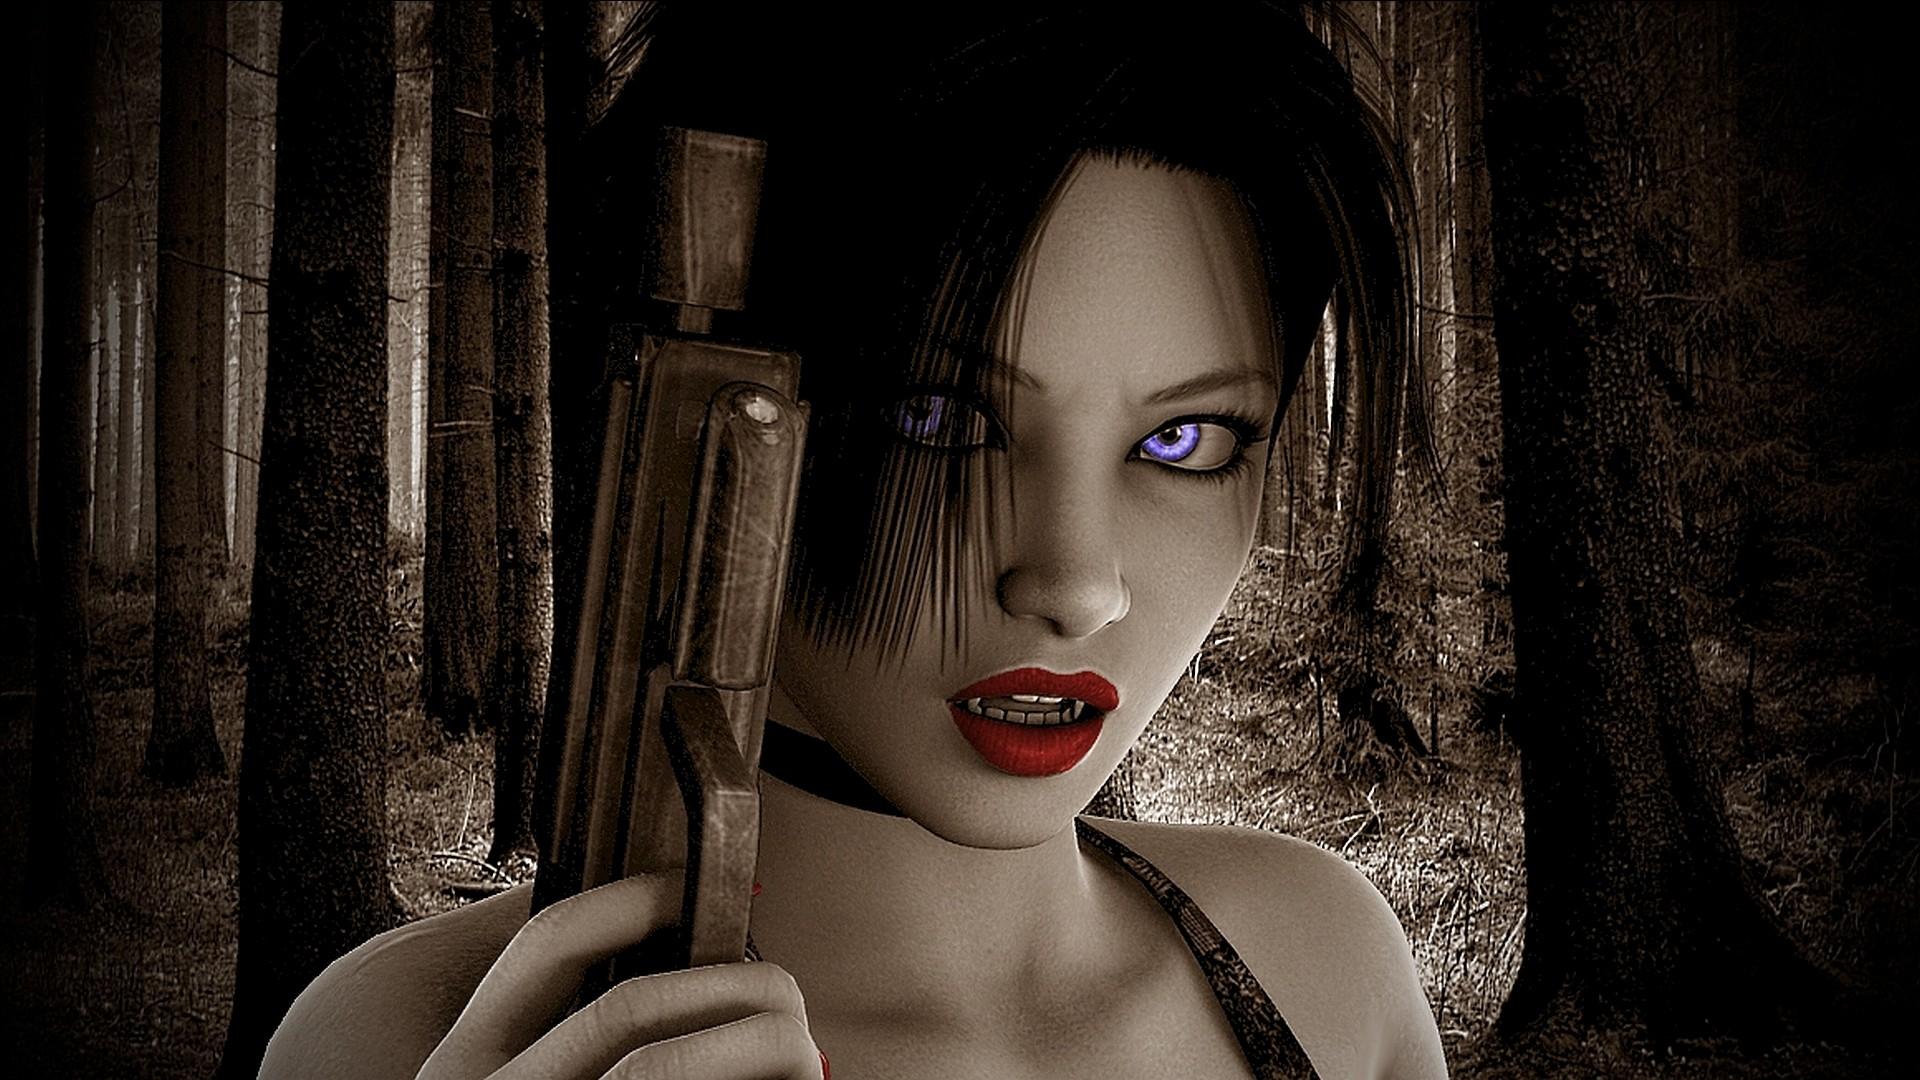 Girls With Guns Weapon Gun Girls Girl Sexy Babe Dark Vampire D Wallpaper At  Dark Wallpapers